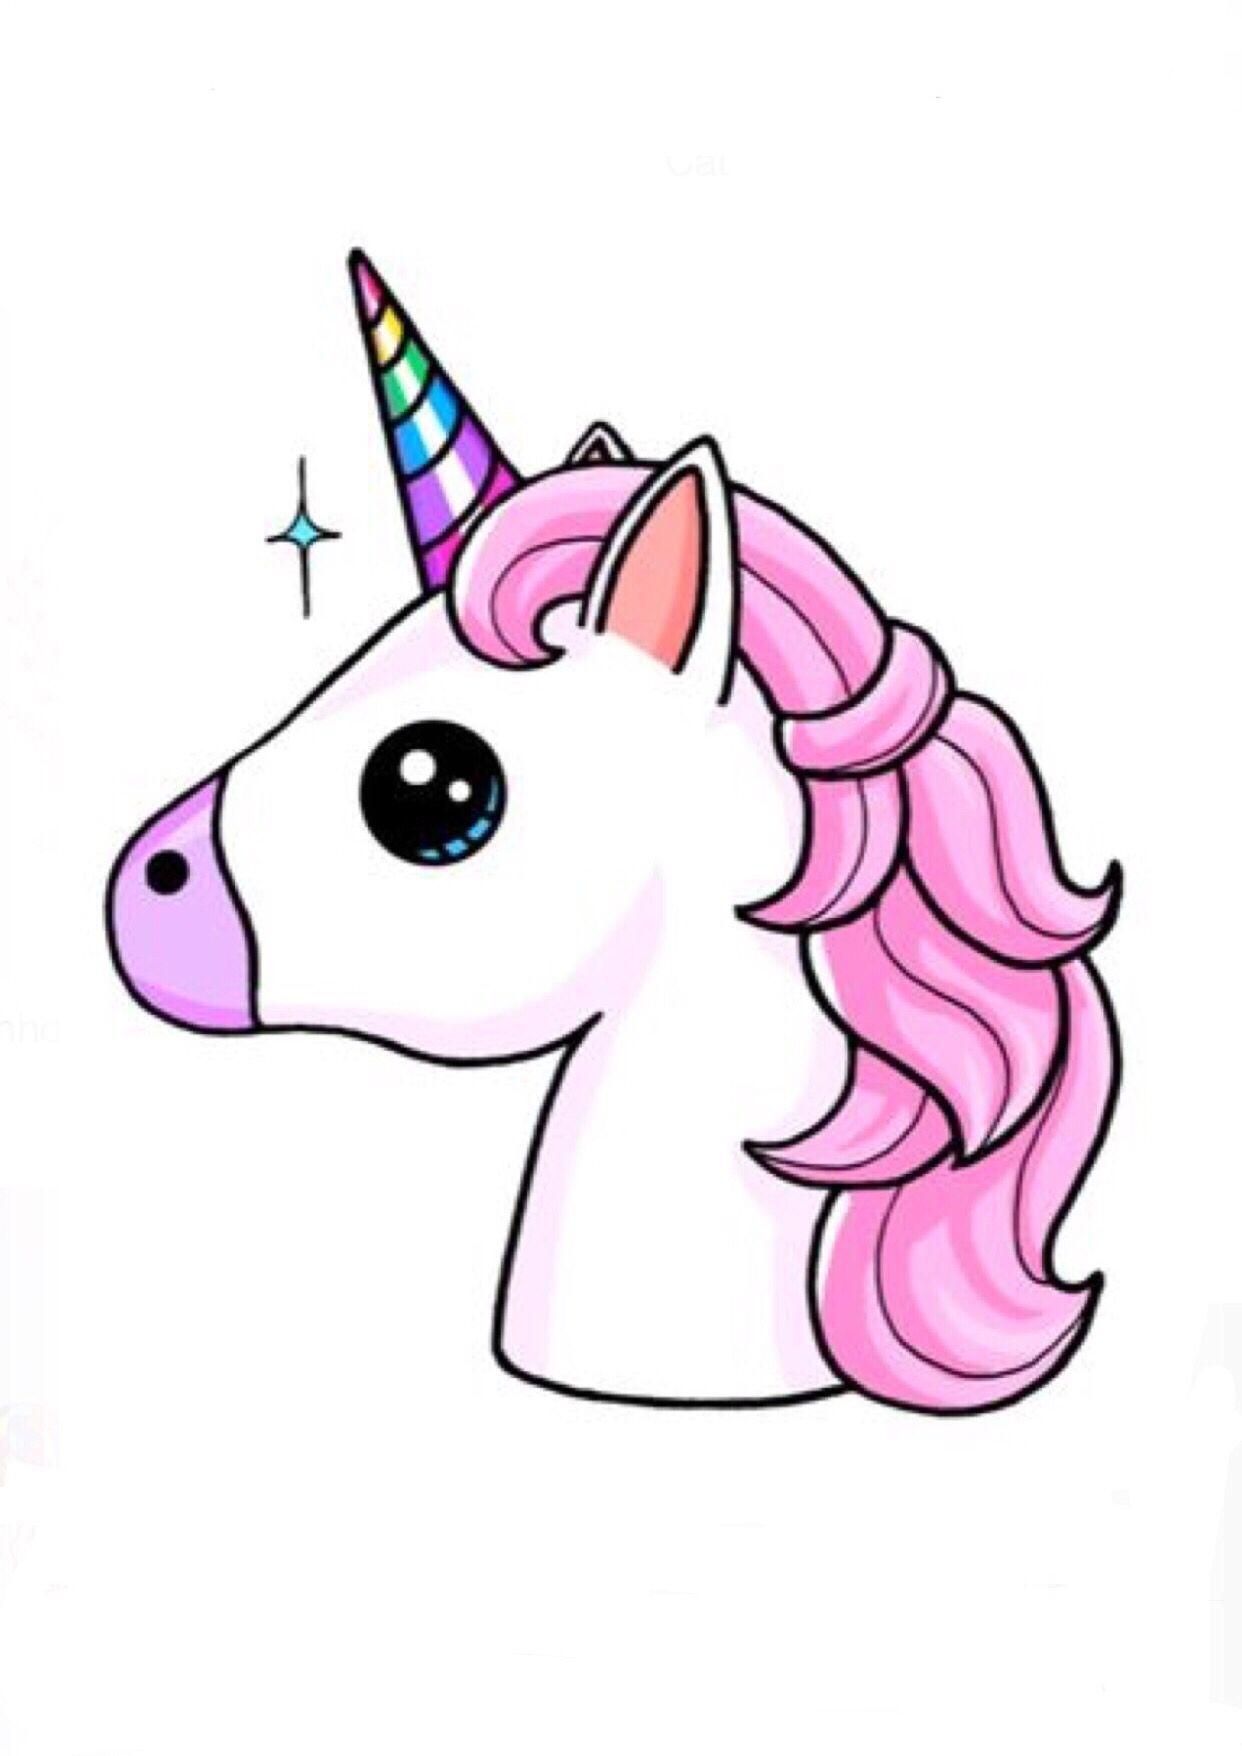 A Picture From Kefir Https Kefirapp Com W 2734561 Kawaii Drawings Cute Drawings Unicorn Drawing